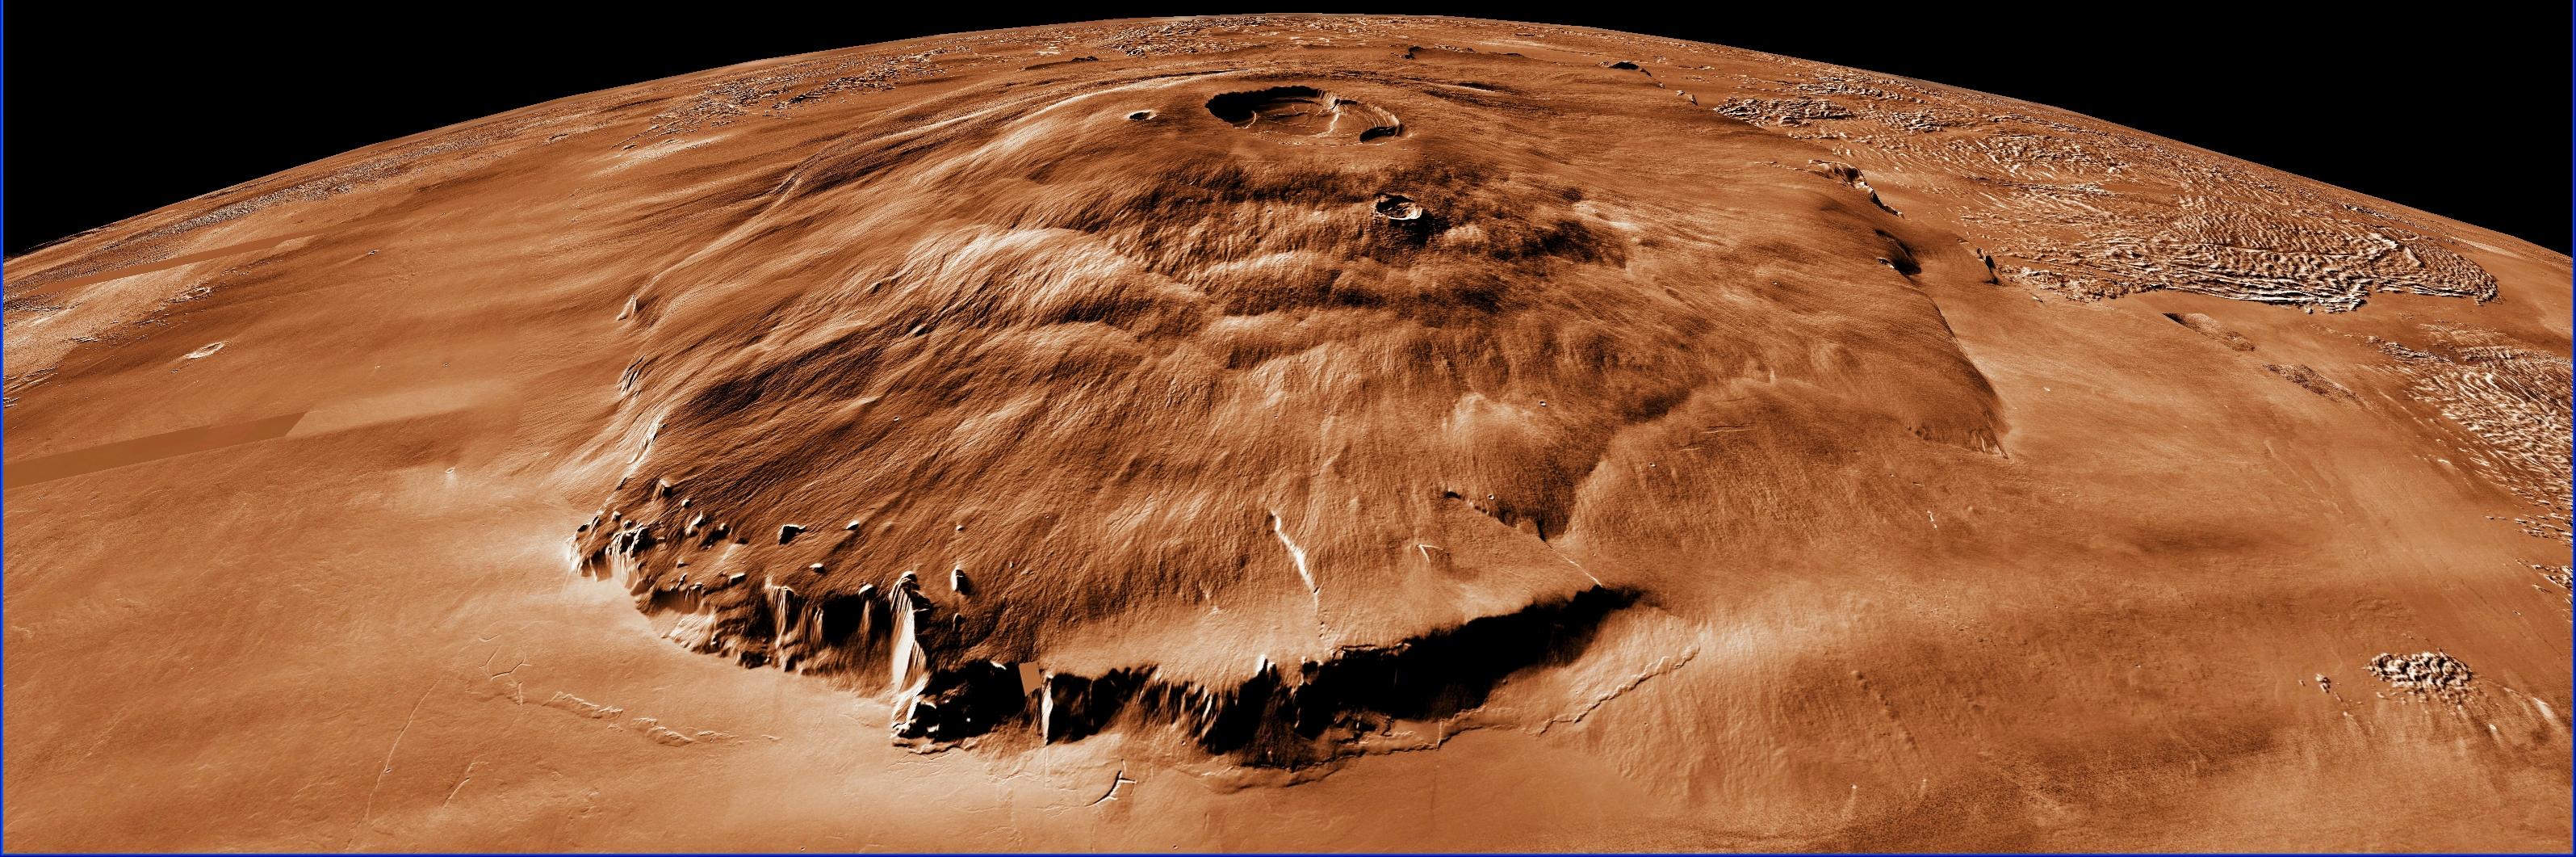 planet mars olympus mons - photo #9